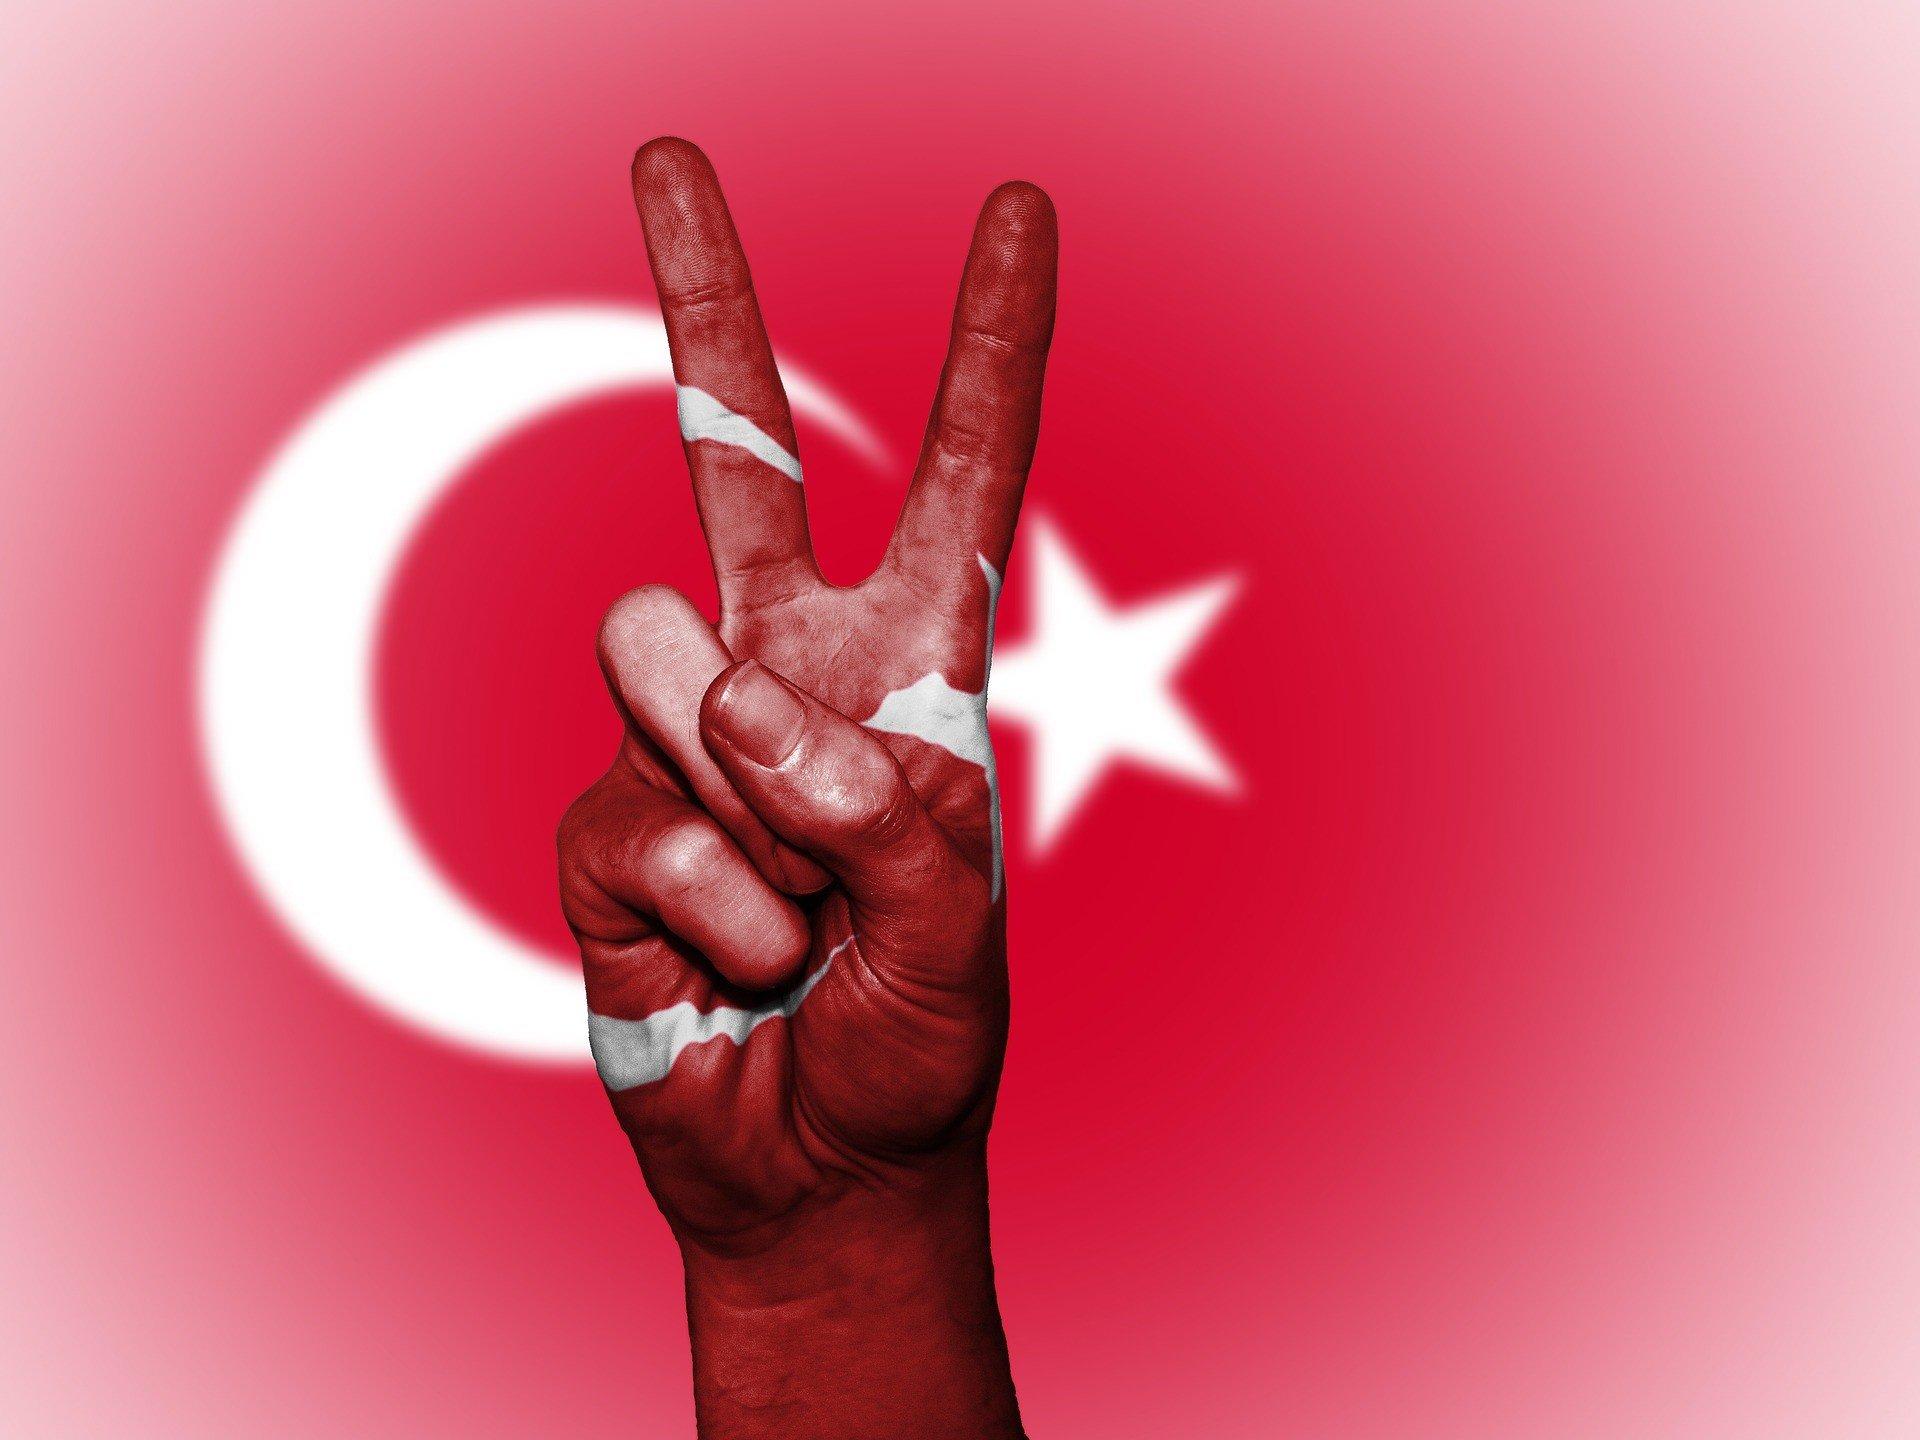 Турция отвергла резолюцию Европарламента